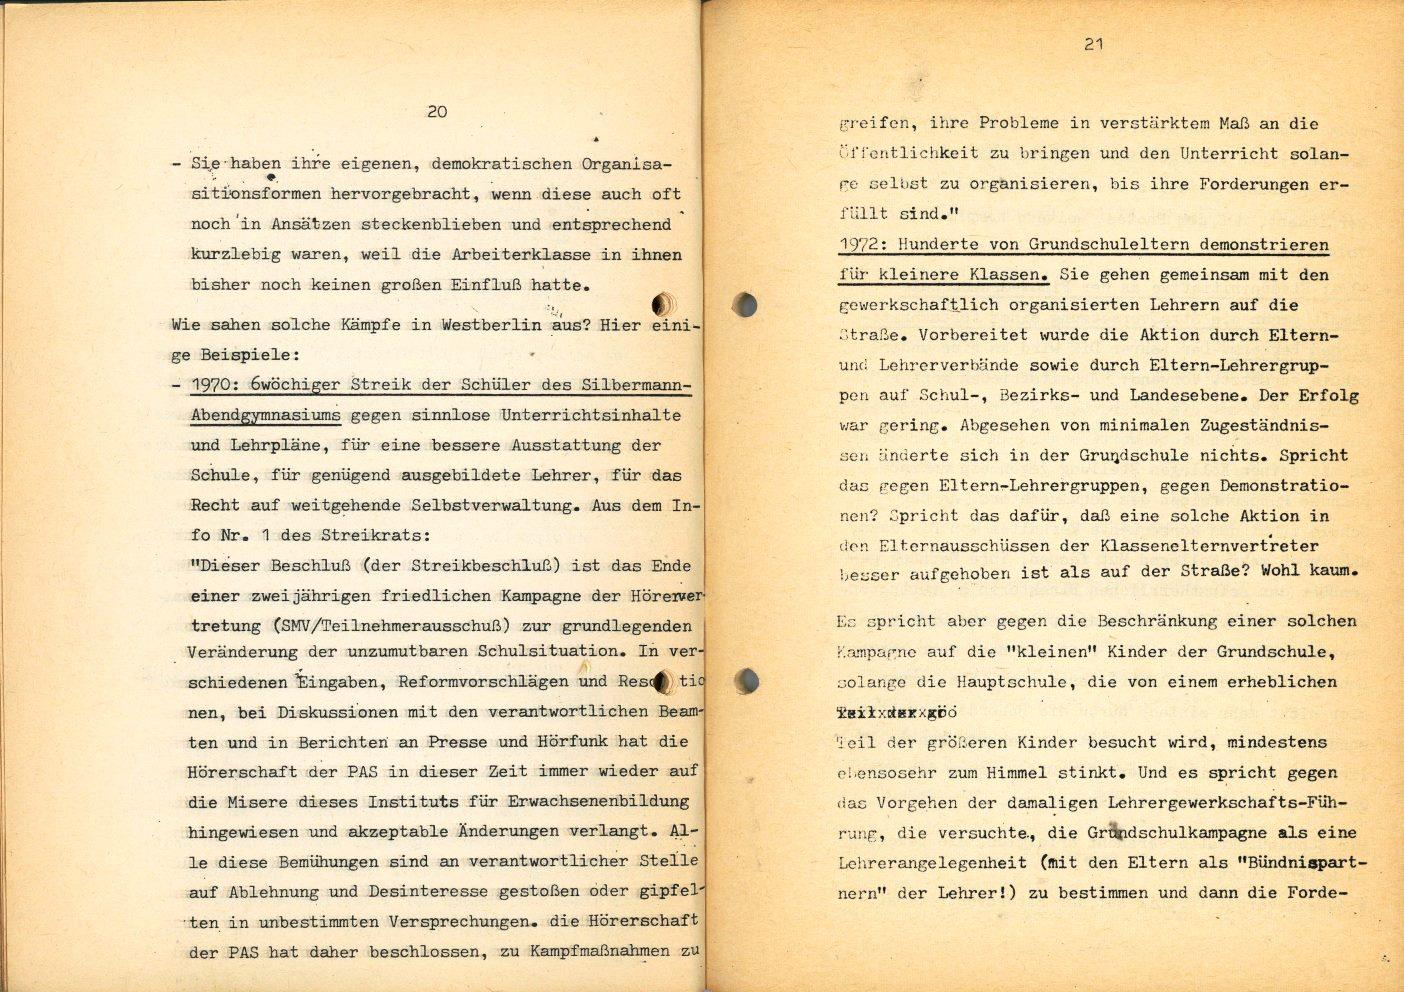 Berlin_SMV_GUV_1974_Schulmisere_13